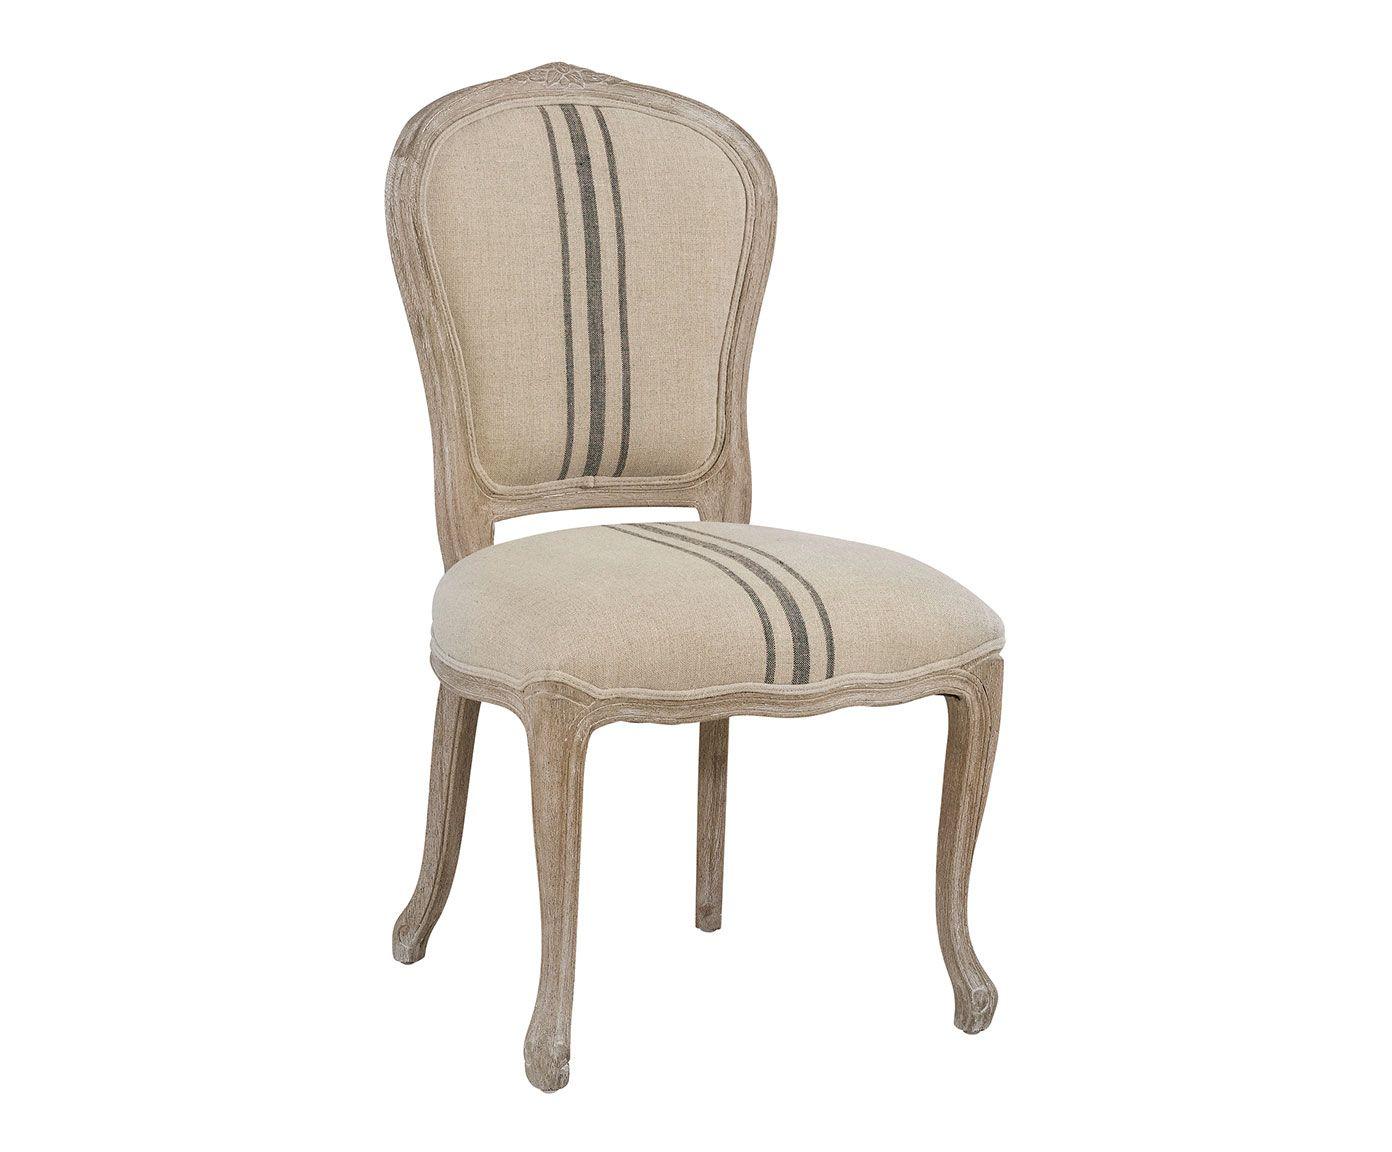 Silla de madera de abedul y algod n tina westwing home living muebles pinterest sillas - Westwing sillas ...